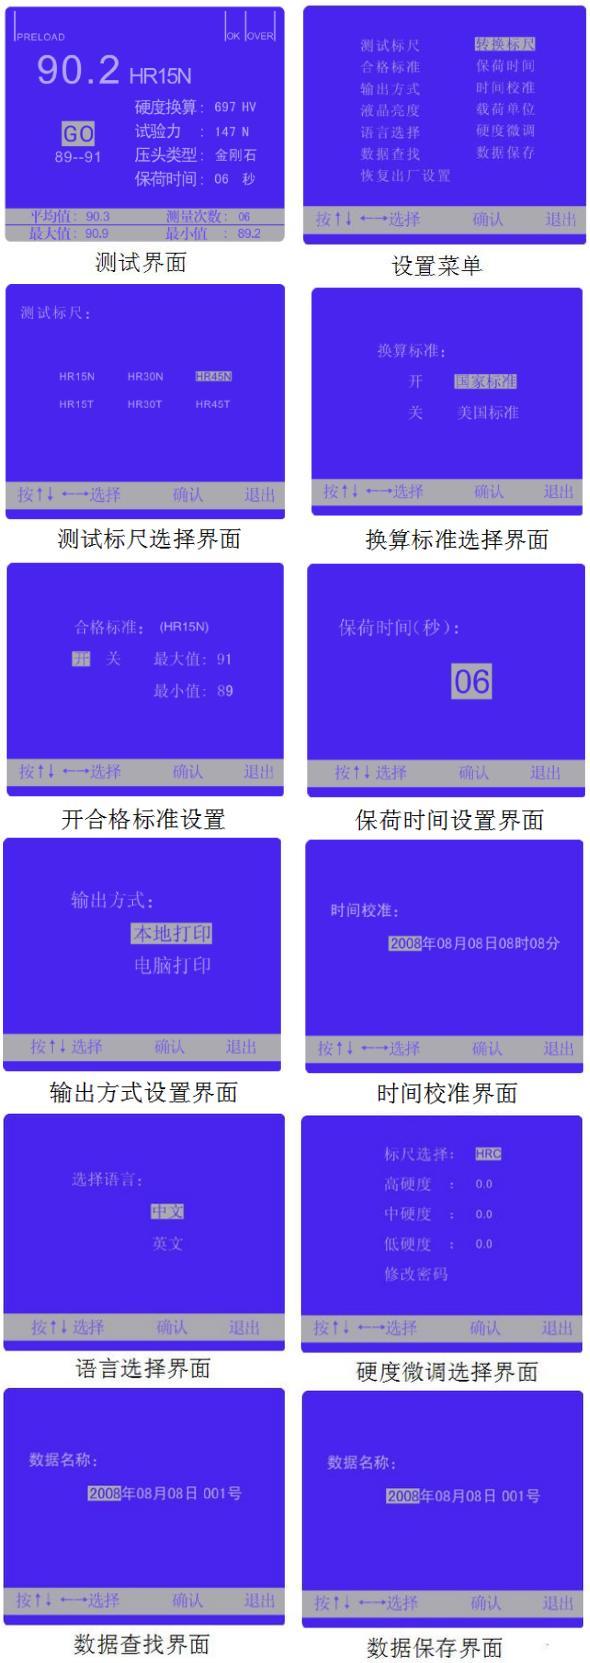 http://www.w-testing.com/uploads/allimg/190601/11291Q043-2.jpg